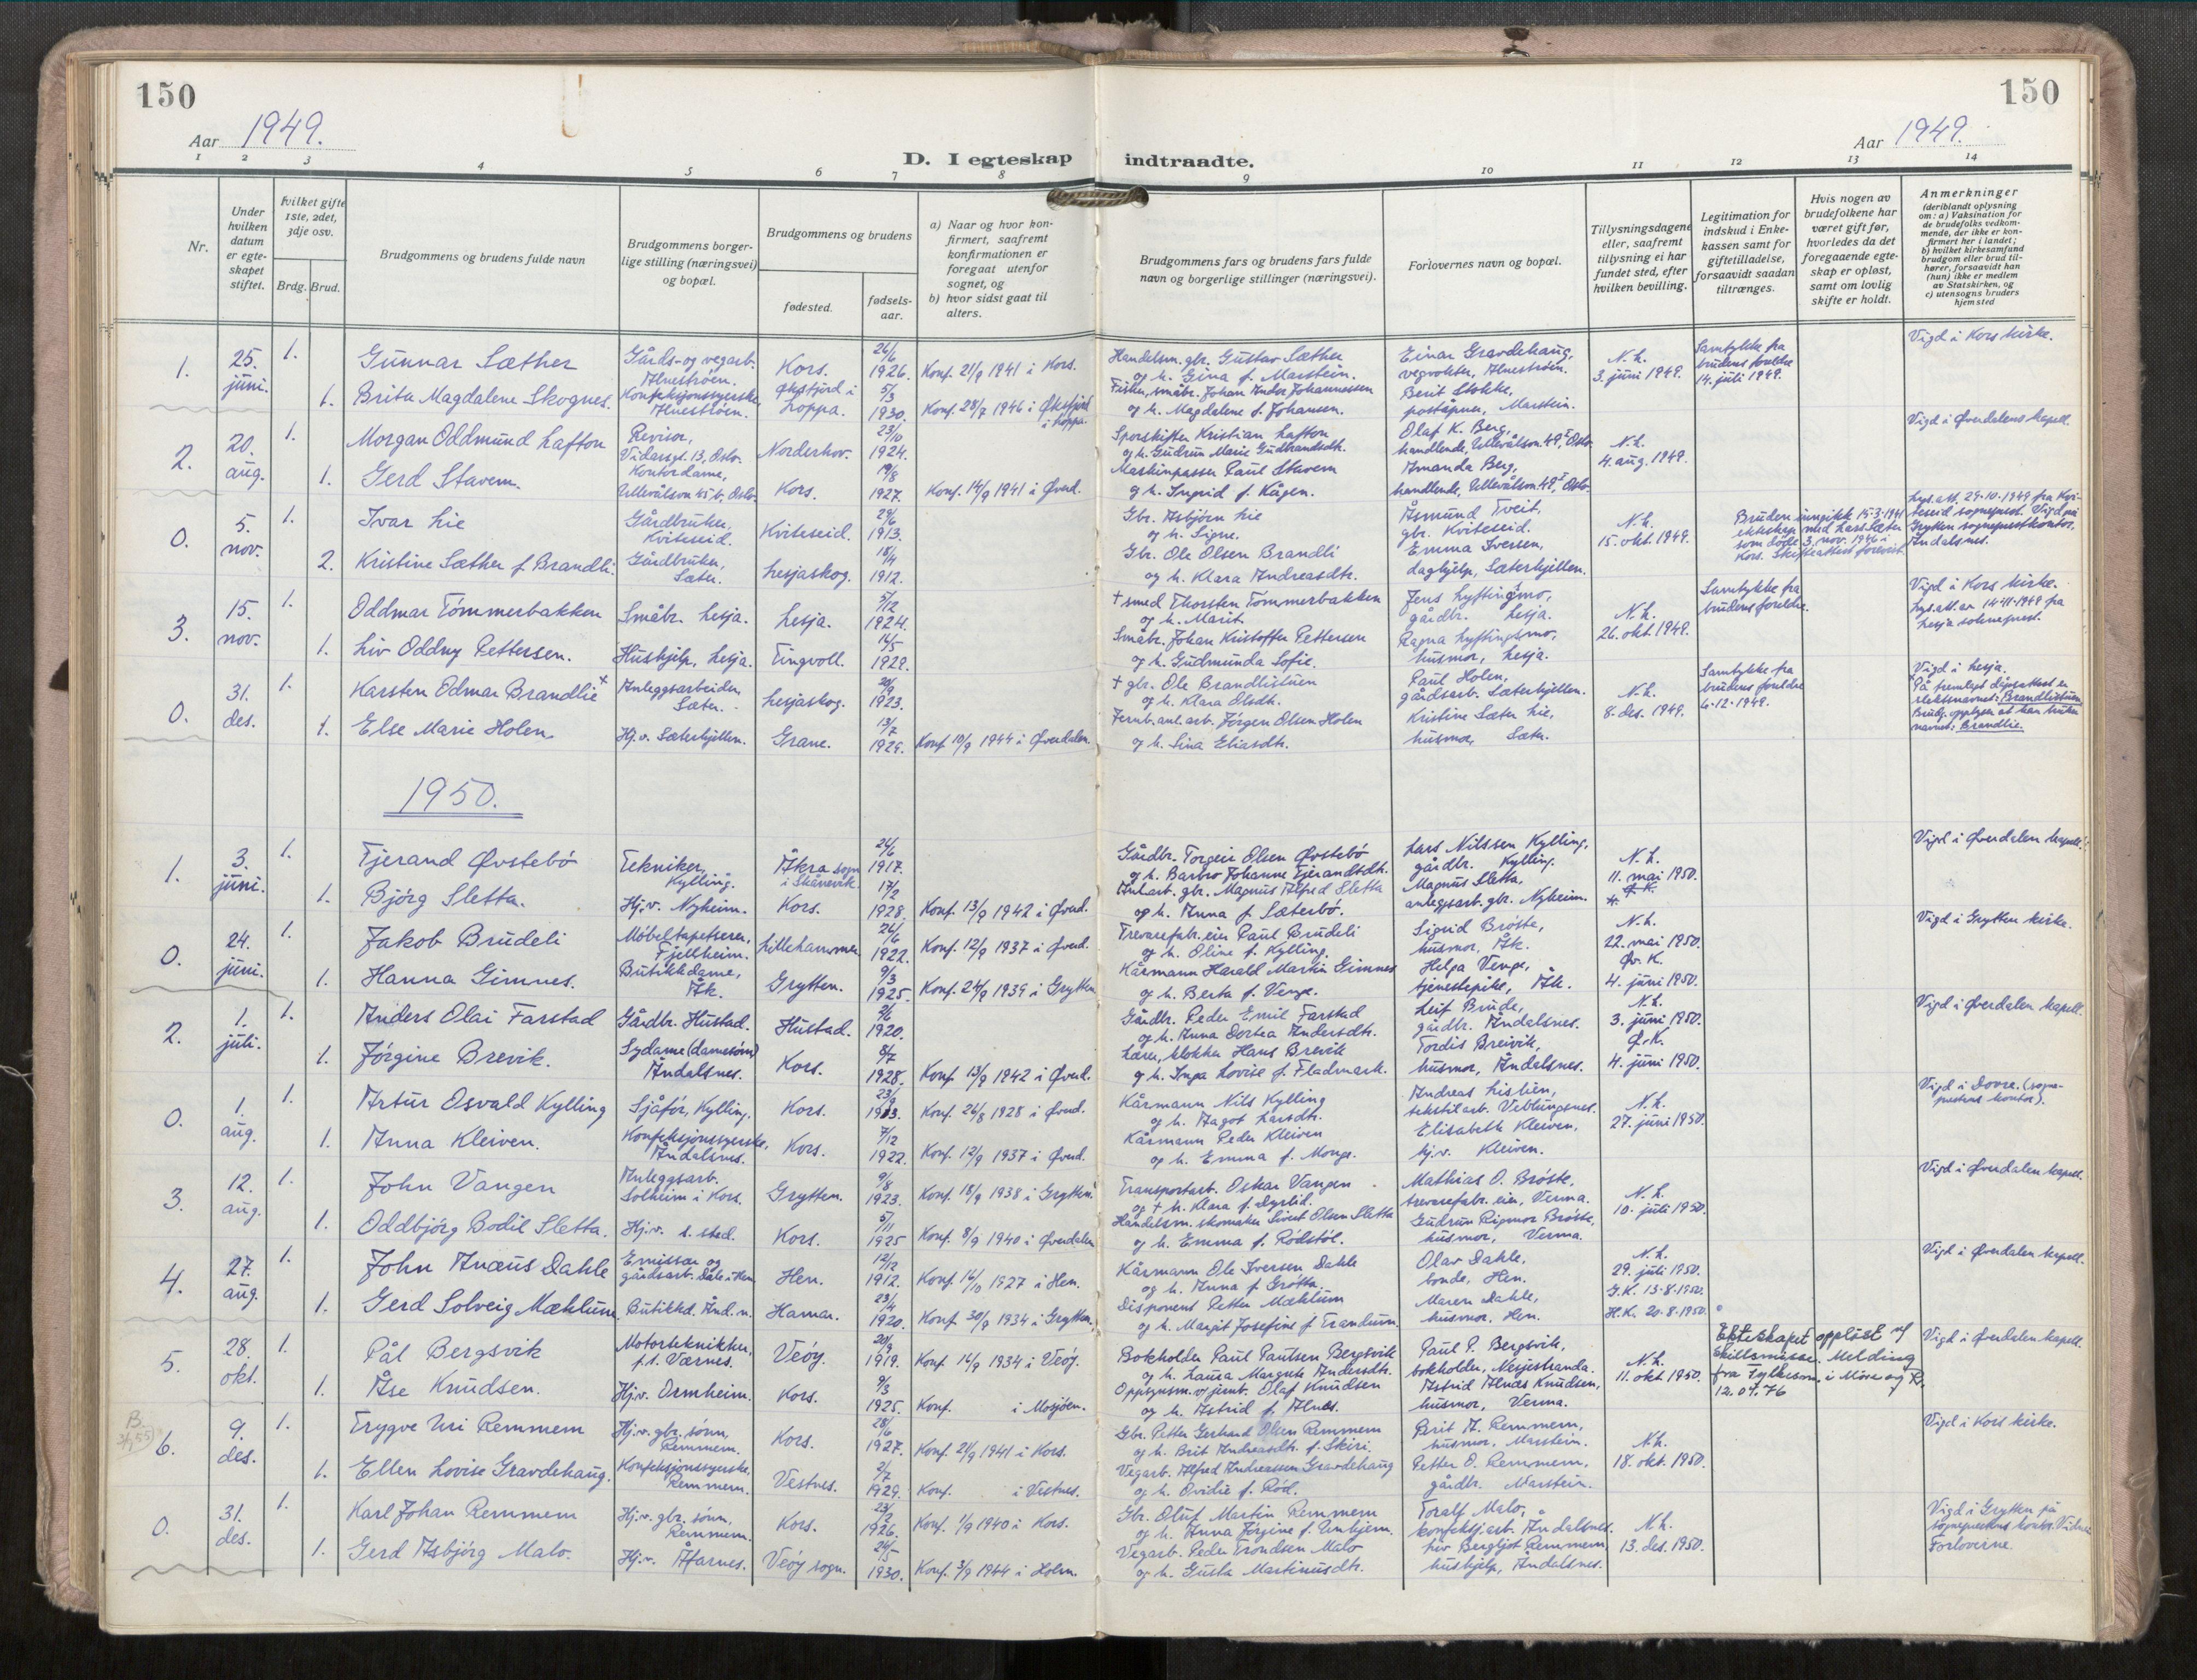 SAT, Grytten sokneprestkontor, Ministerialbok nr. 546A04, 1919-1956, s. 150